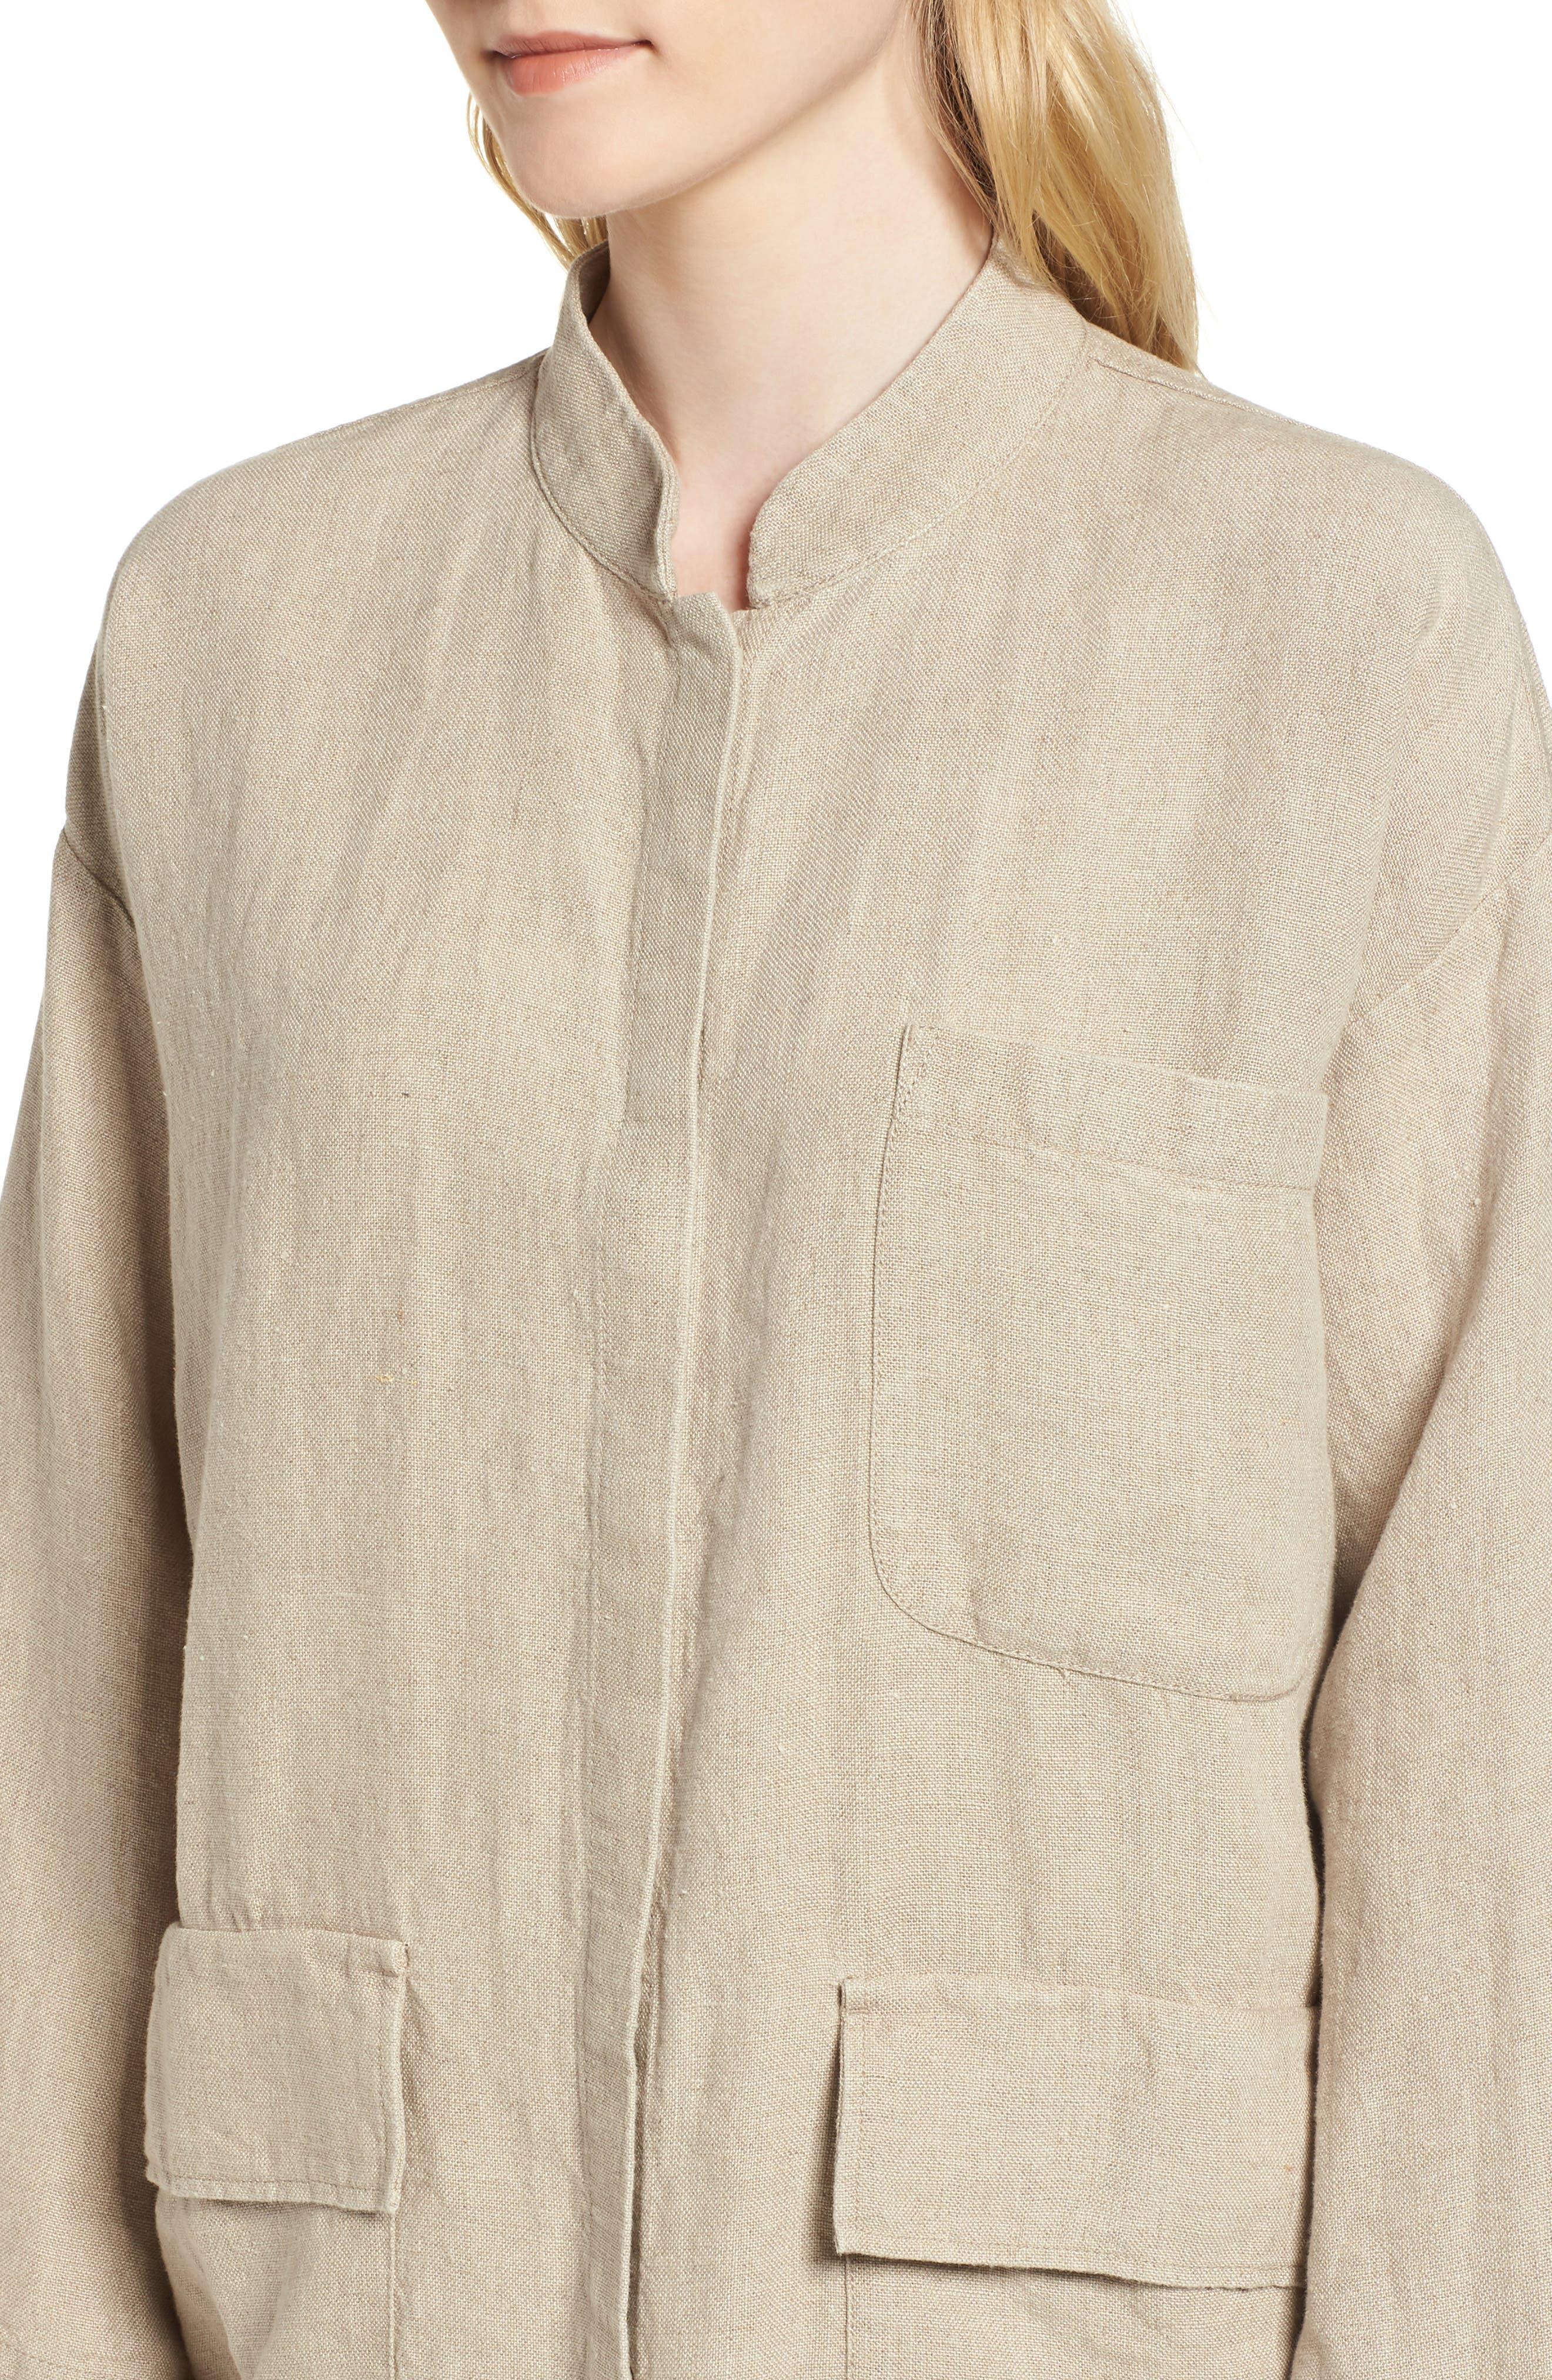 Organic Linen Jacket,                             Alternate thumbnail 9, color,